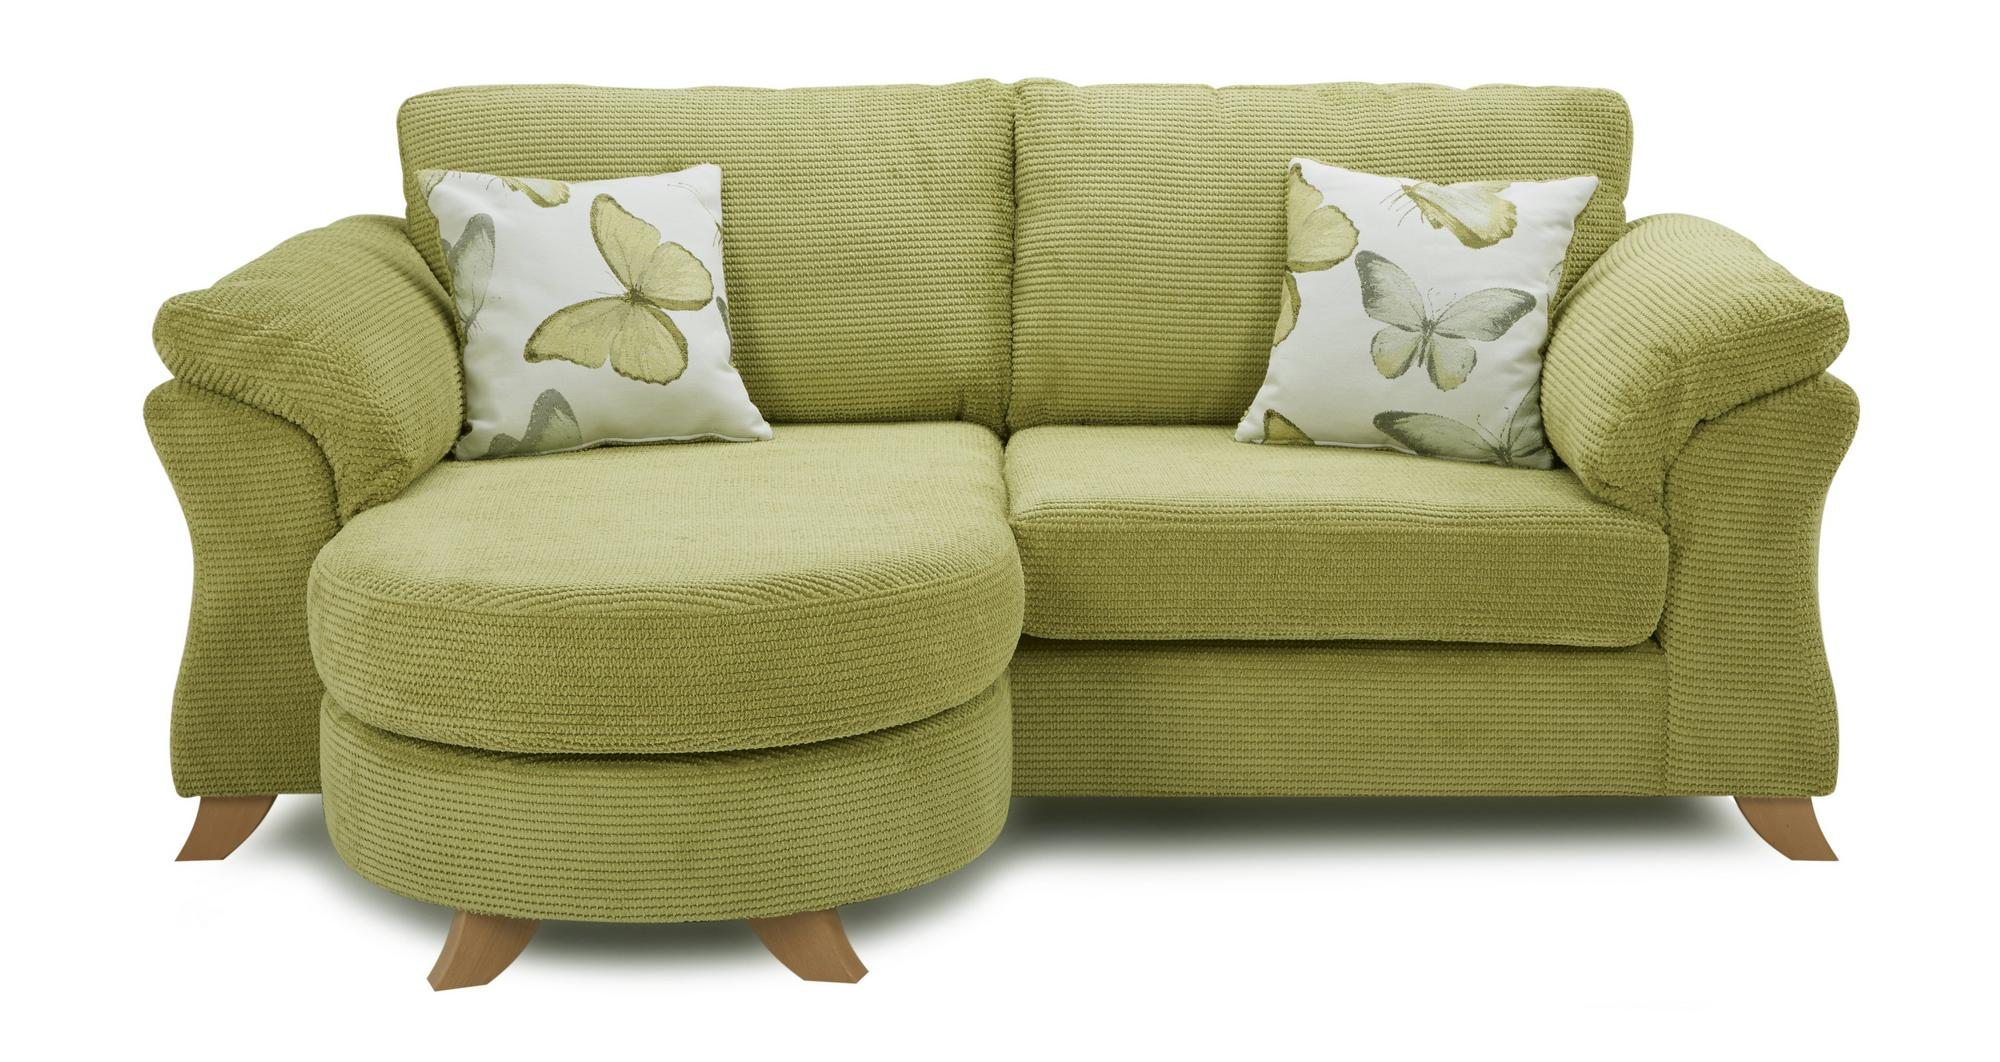 dfs alegra green fabric 3 seater formal back lounger sofa